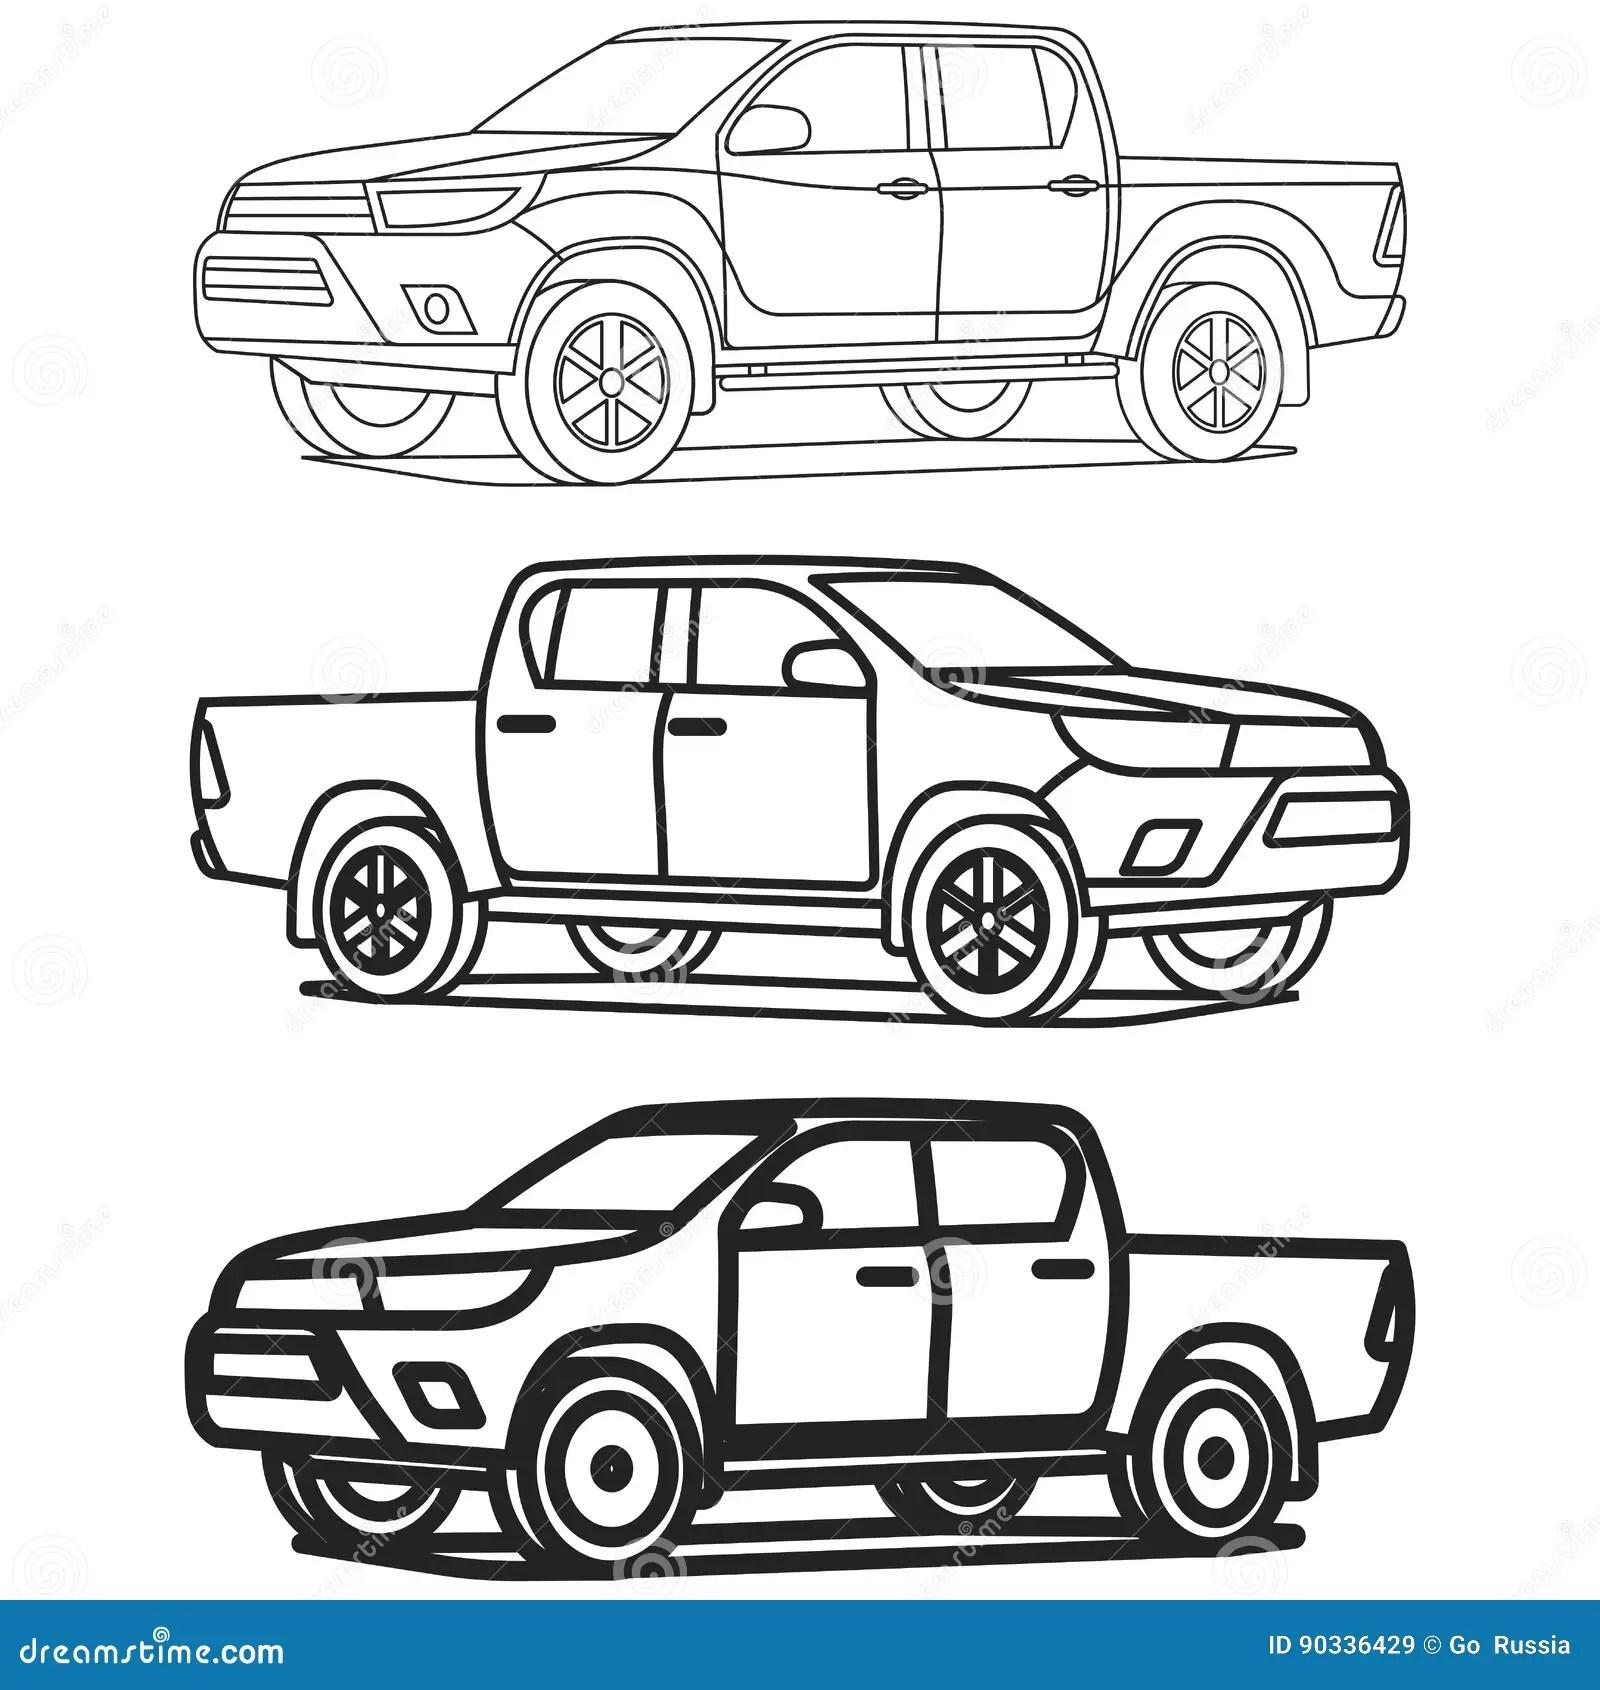 El Esquema De La Camioneta Pickup Fijo En El Ejemplo